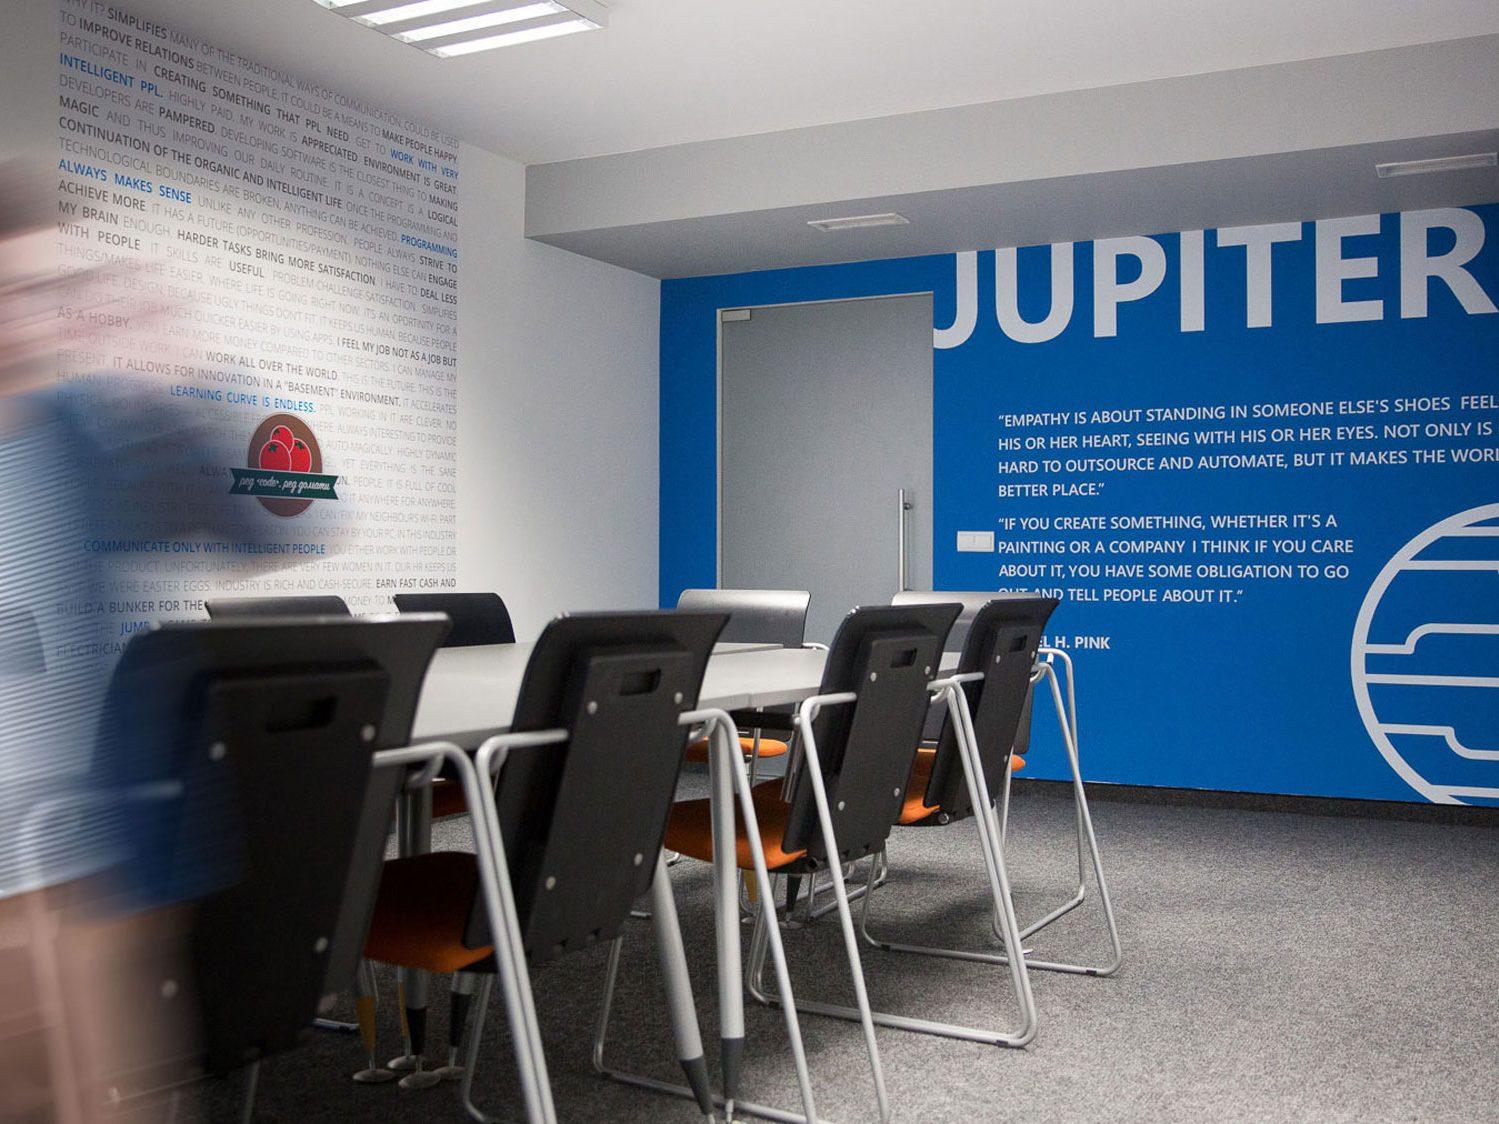 Meeting room dedicated to Jupiter